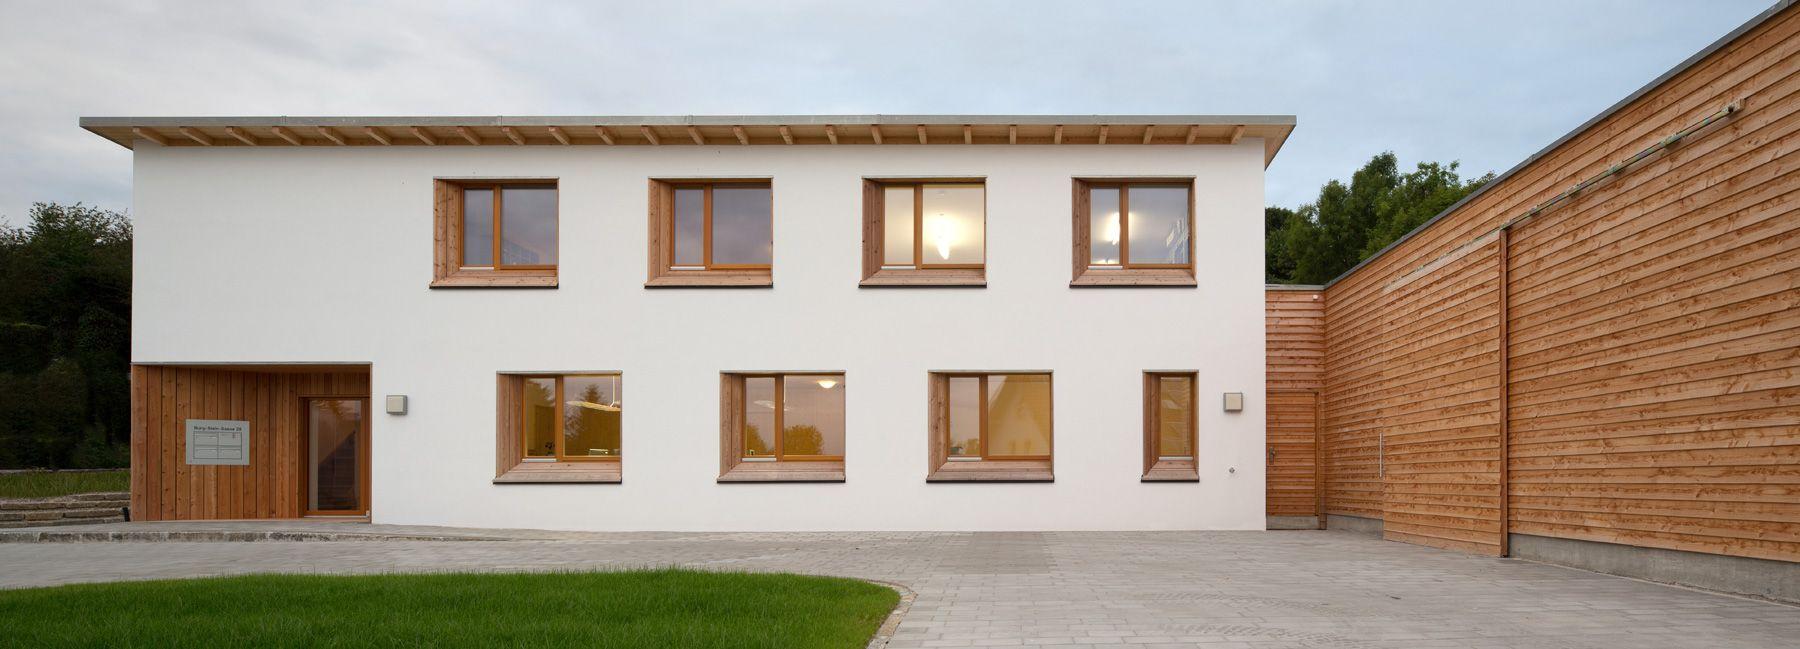 pers nliche beratung jura holzbau holzhaus bayern holzhaus regensburg holzhaus ingolstadt. Black Bedroom Furniture Sets. Home Design Ideas